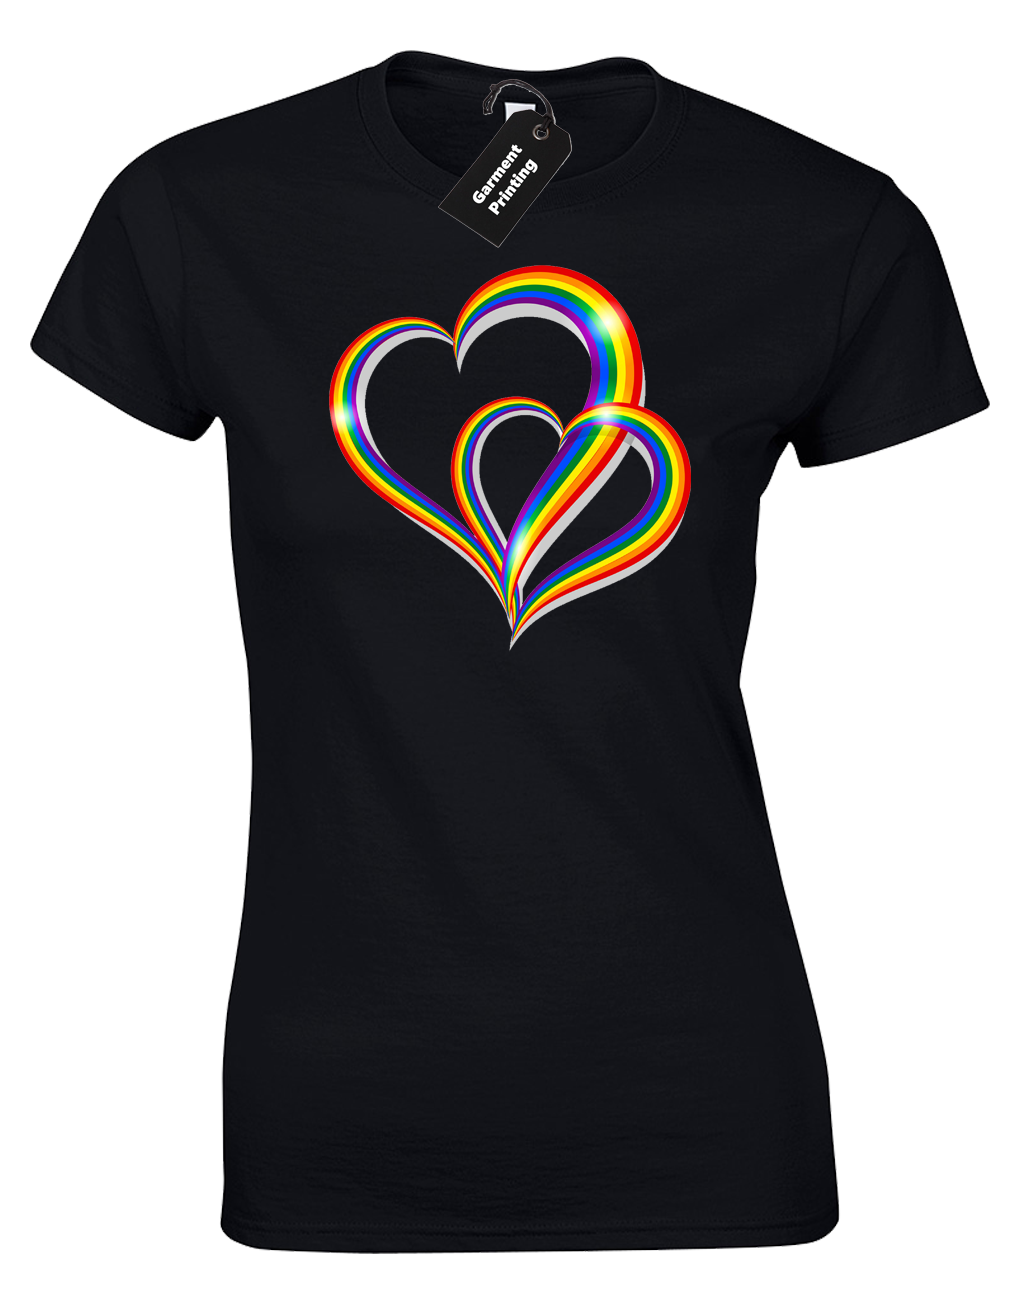 2 Pride Hearts Ladies T-Shirt Gay Lesbian Lgbt Unisex Rainbow Womens Top ( Col) 12